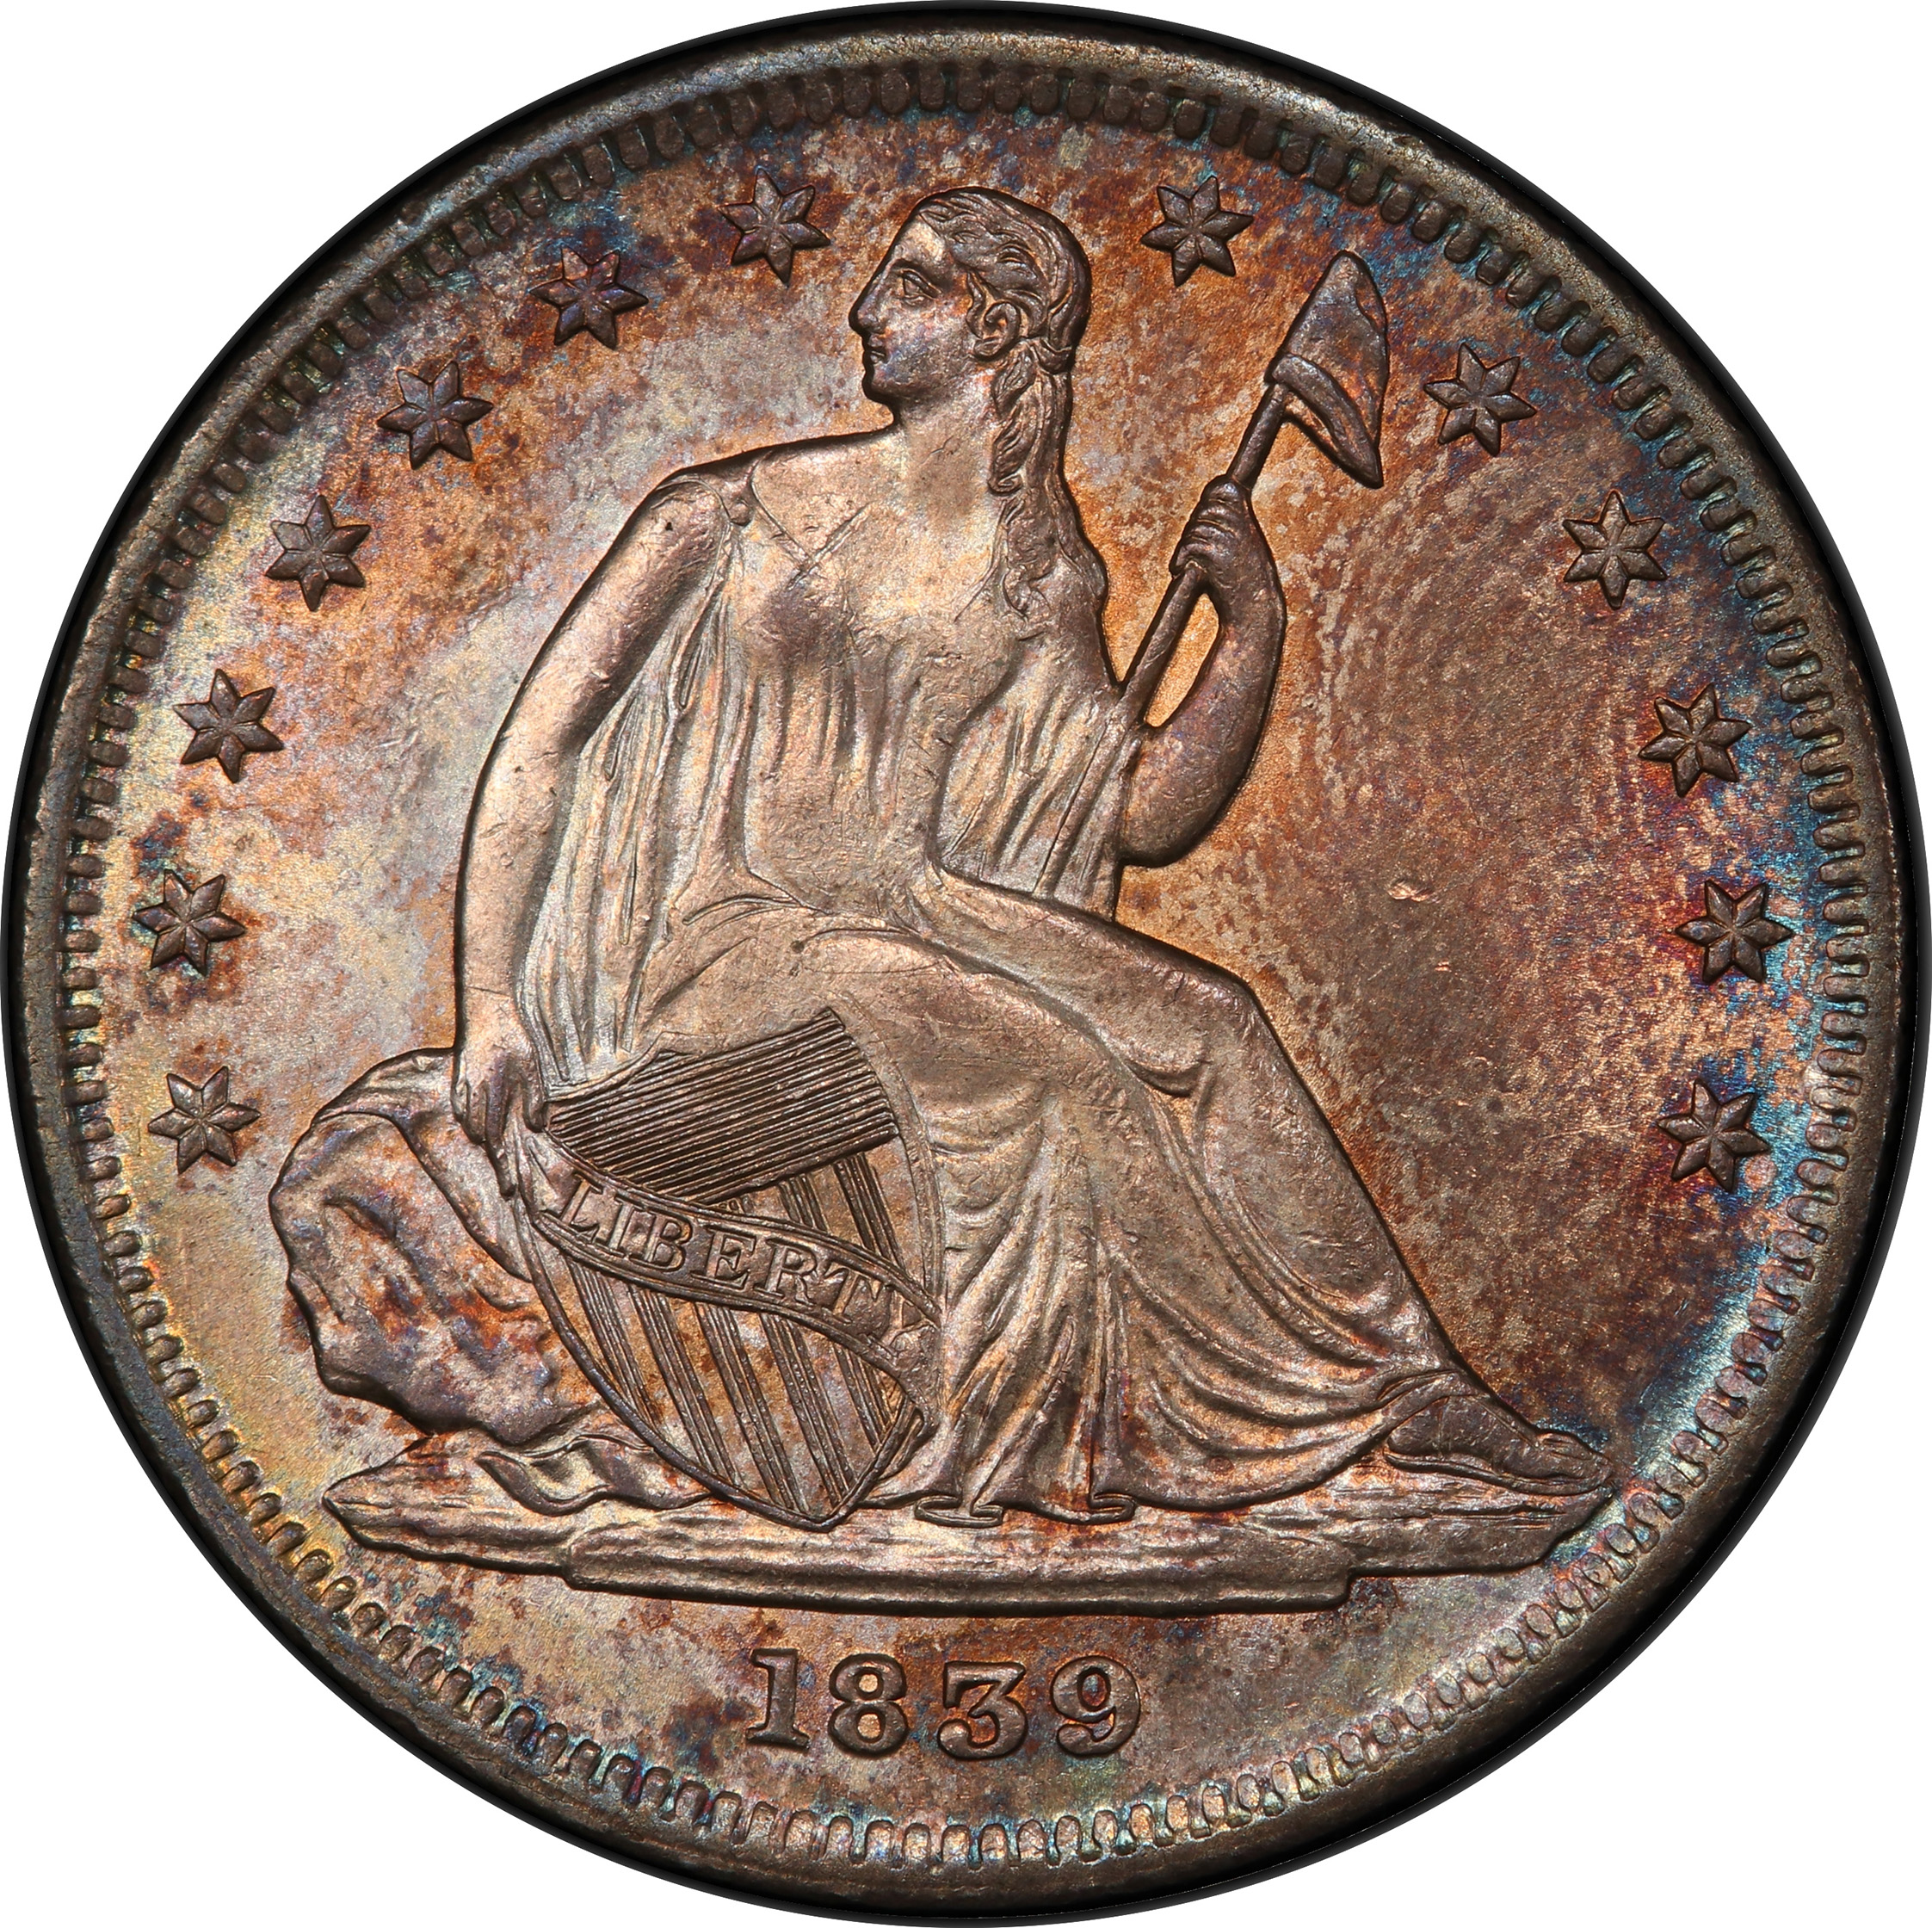 1839 Liberty Seated 50c No Drapery Rare Coin